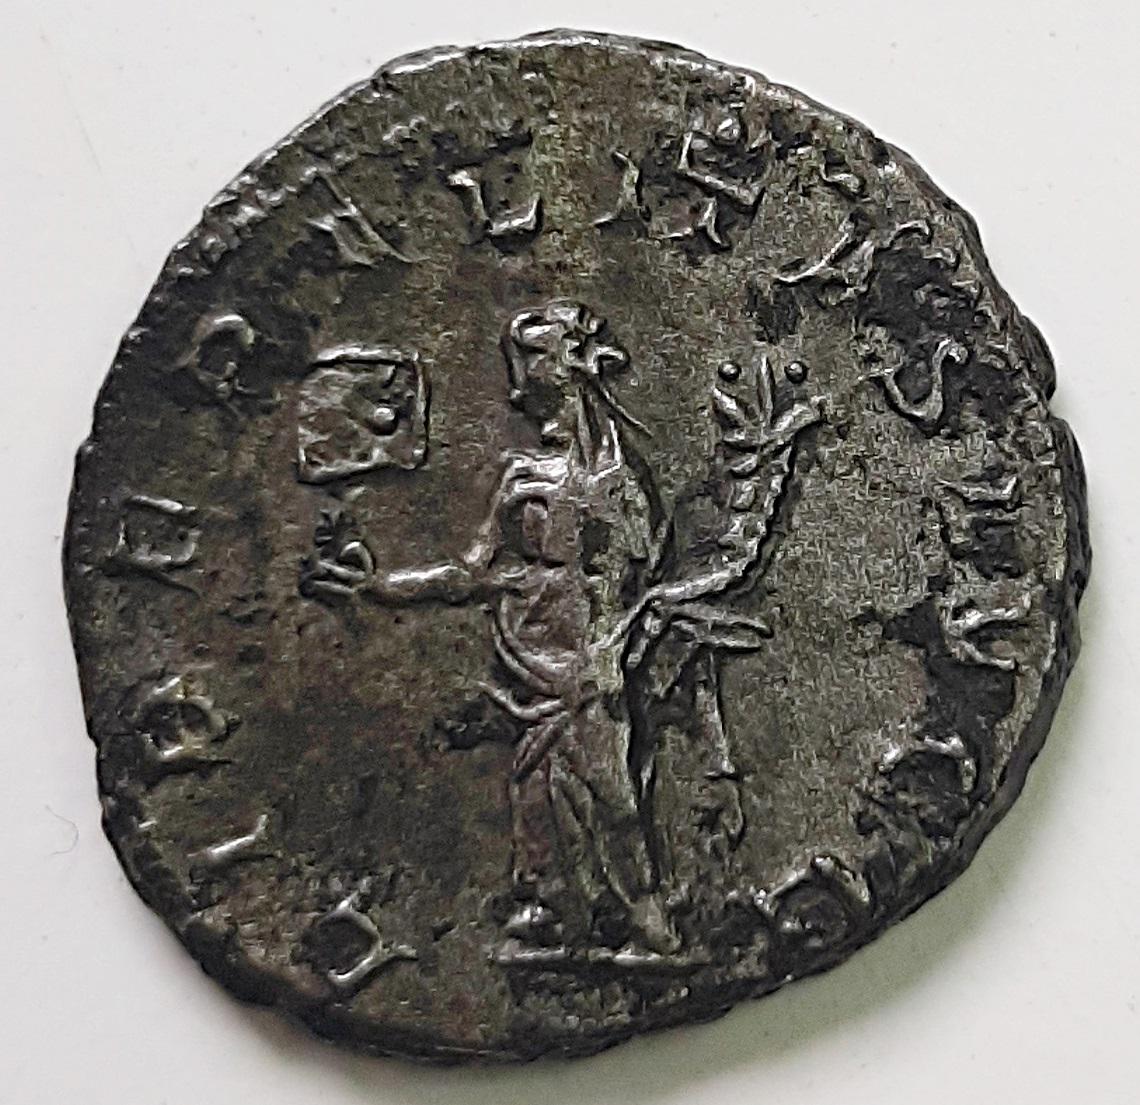 Antoniniano de Volusiano. LIBERALITAS AVGG. Roma Volusiano-Librev